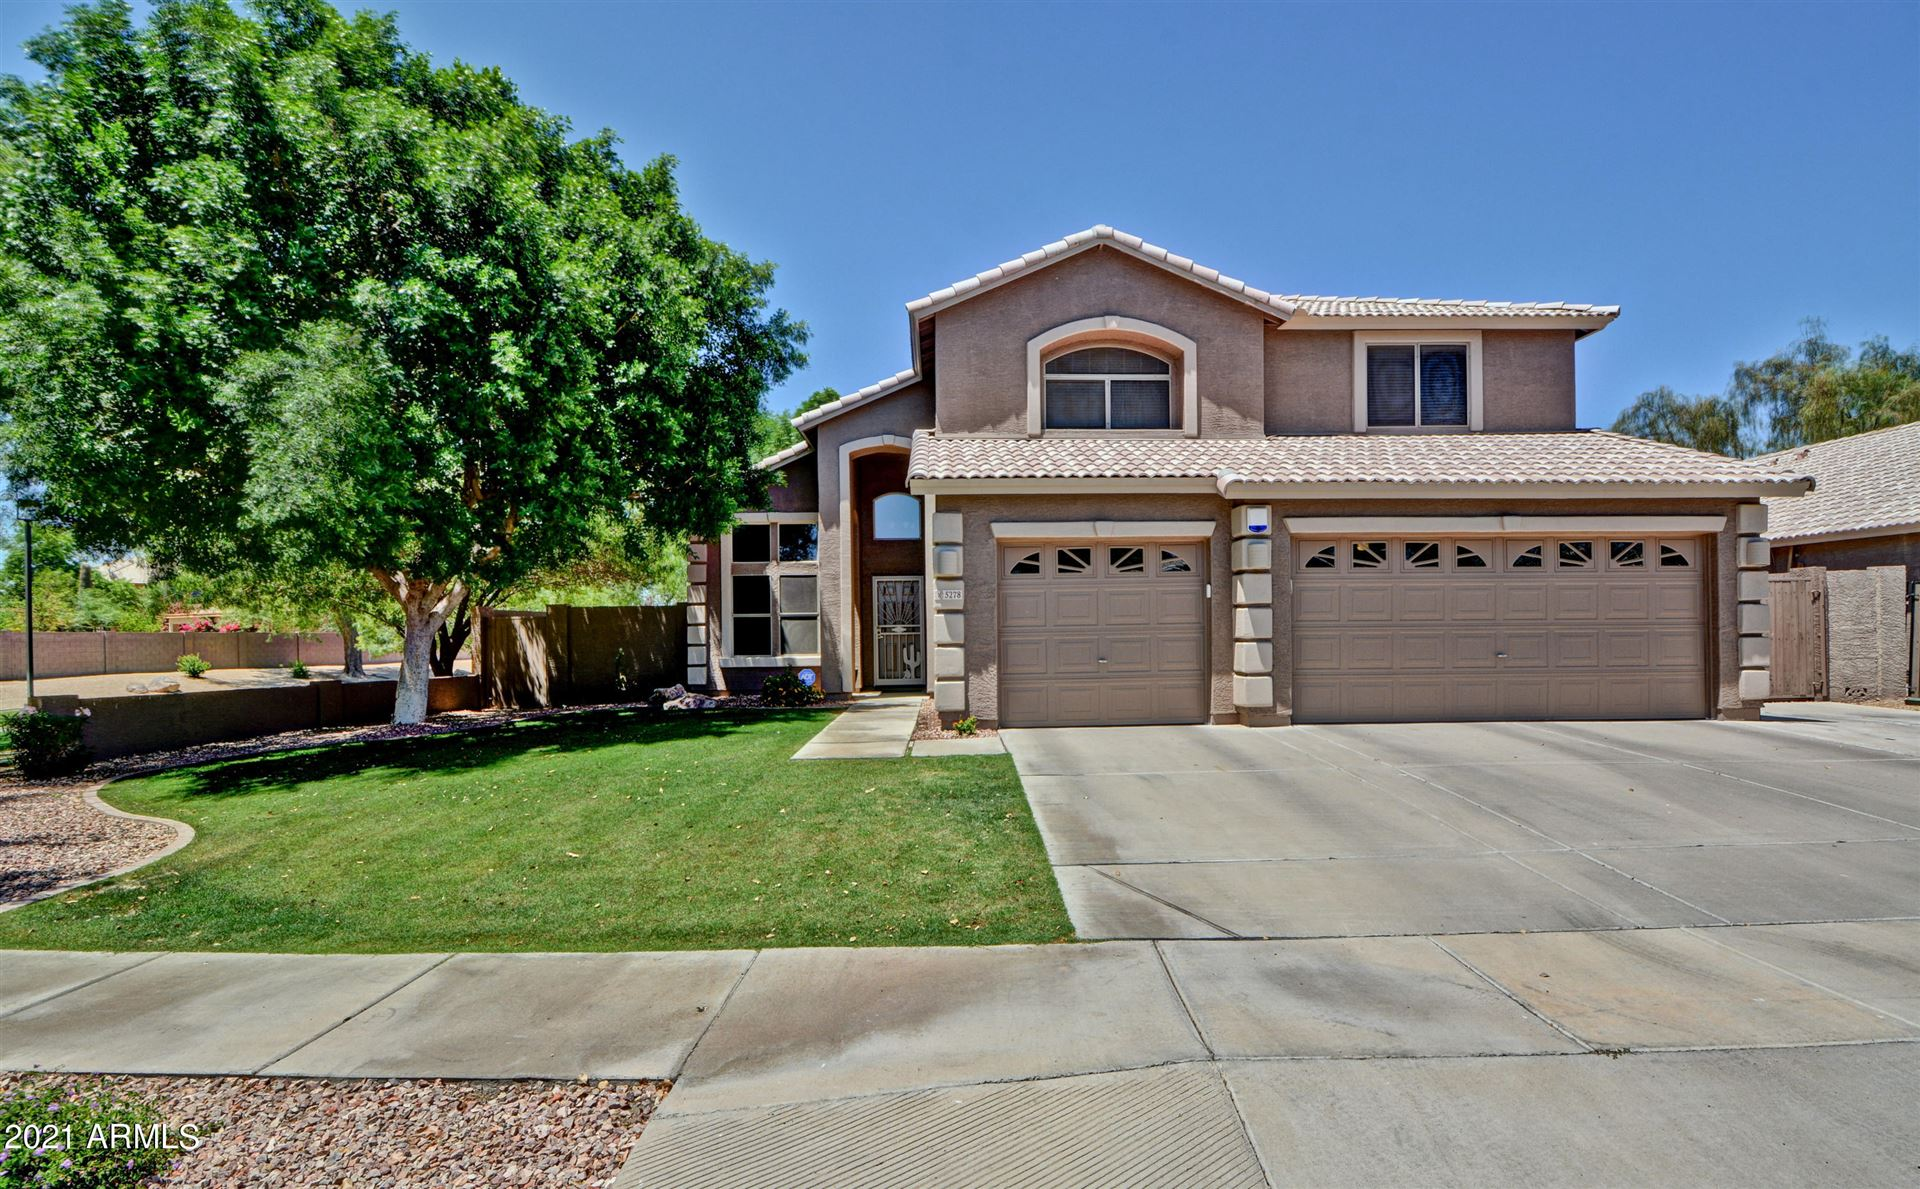 5278 W FRIER Drive, Glendale, AZ 85301 - MLS#: 6241230